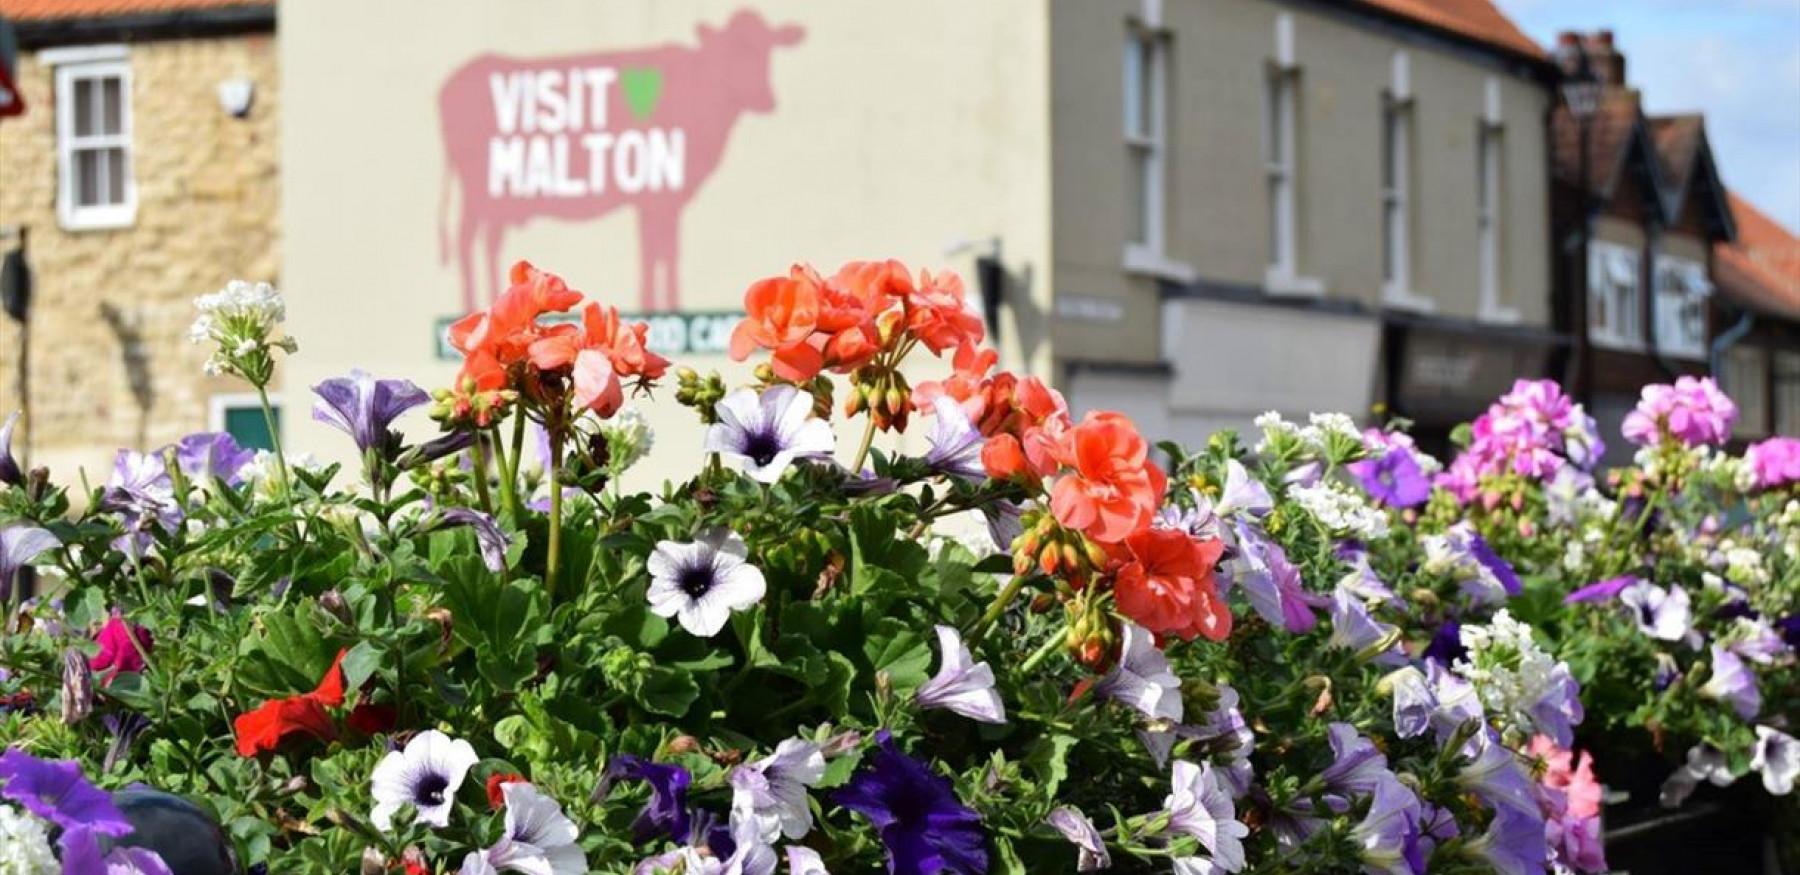 Malton Monthly